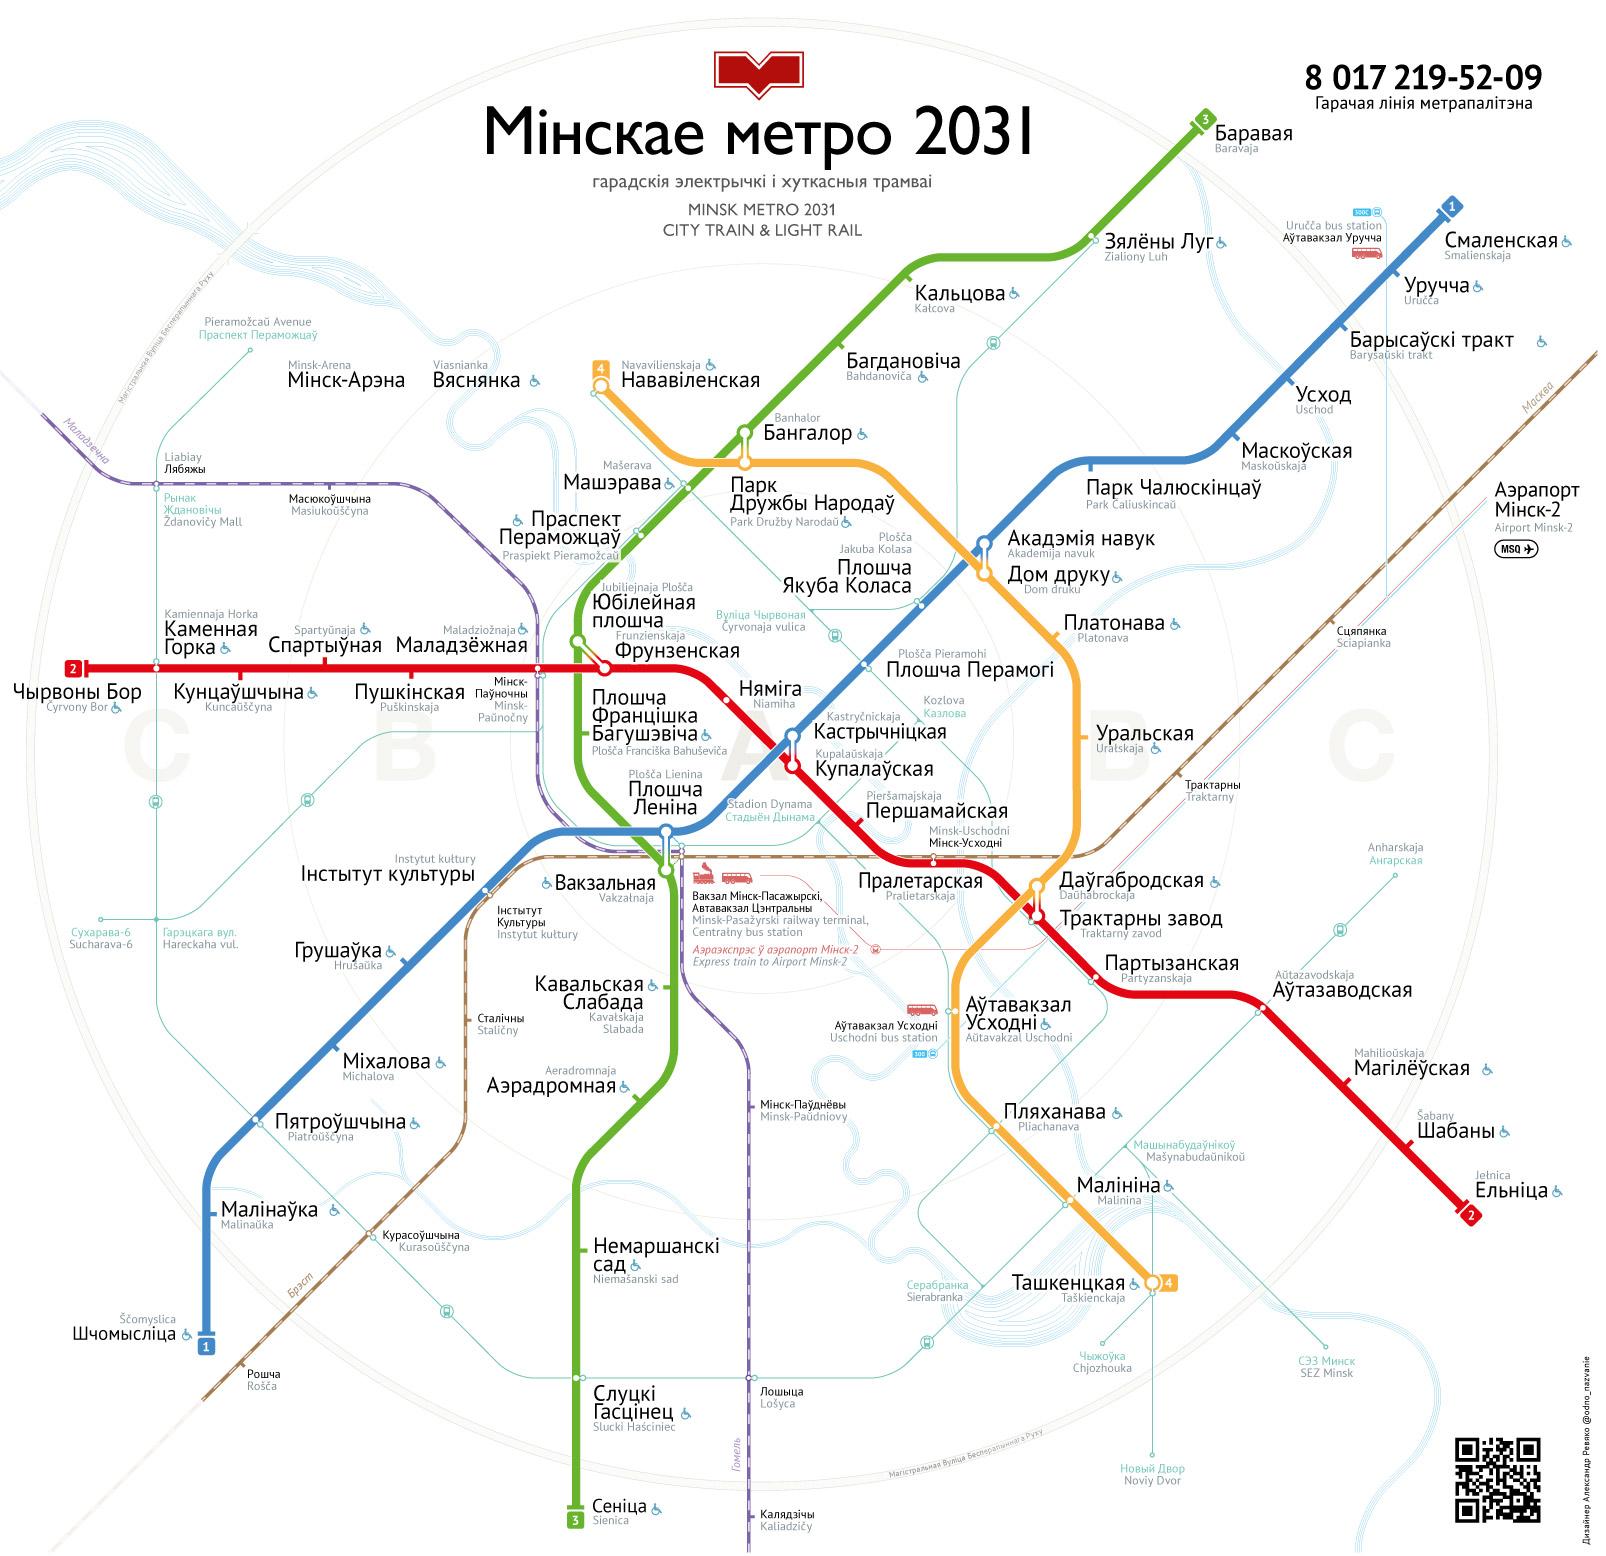 Схема минского метрополитена 2031